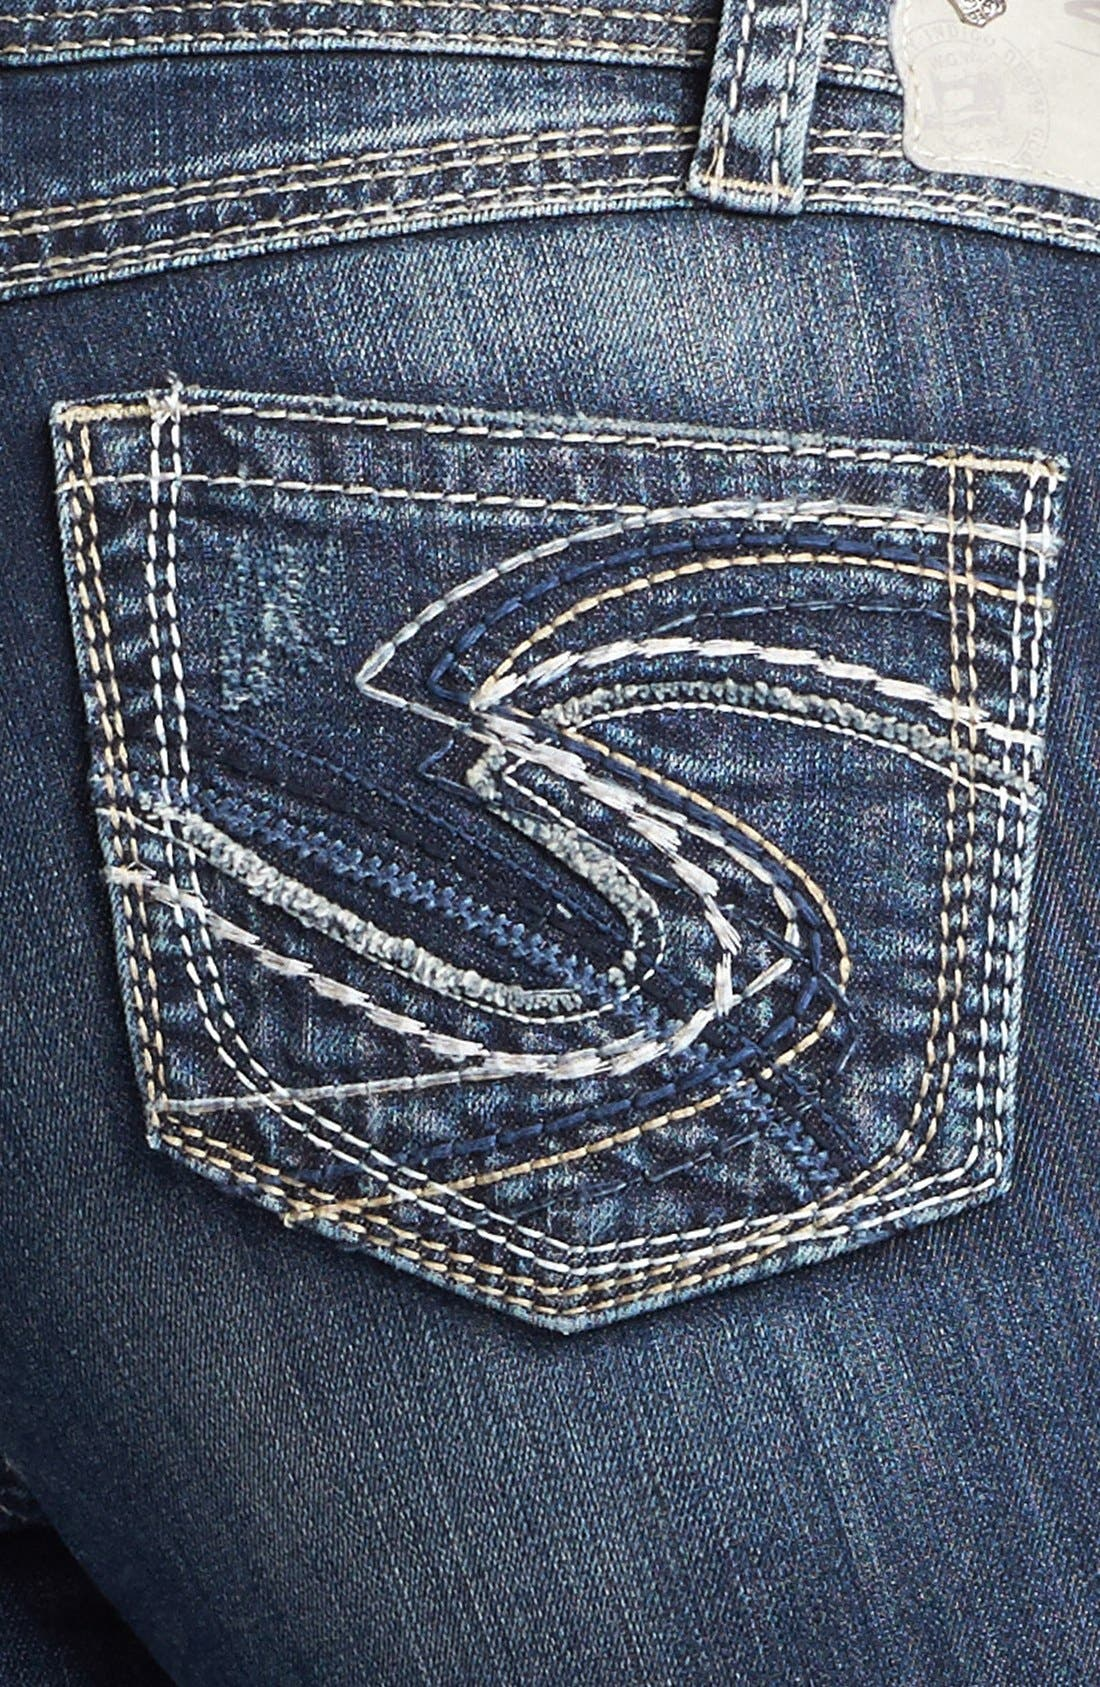 Alternate Image 3  - Silver Jeans Co. 'Twisted' Cuff Capri Jeans (Juniors Plus)